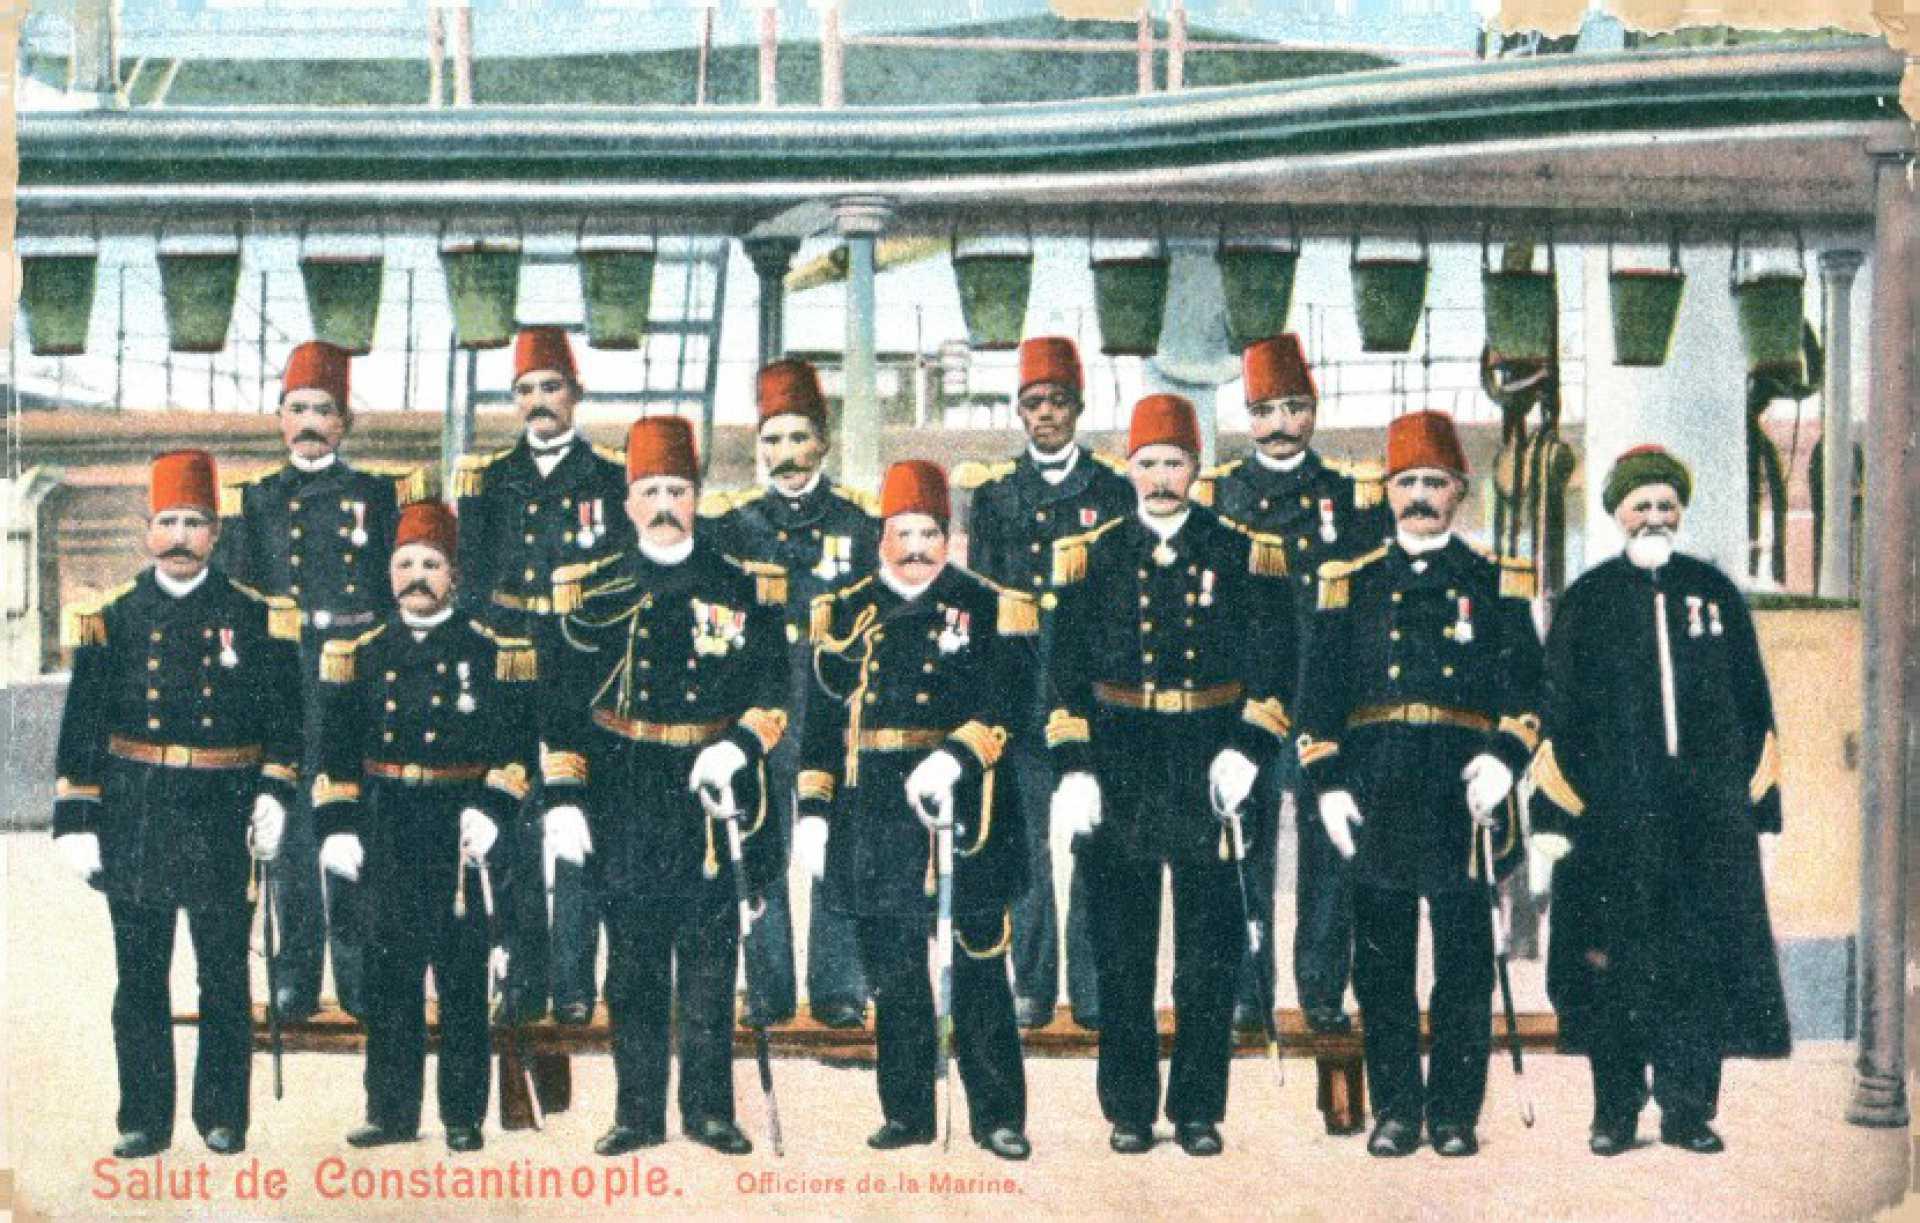 Officiers de la Marine